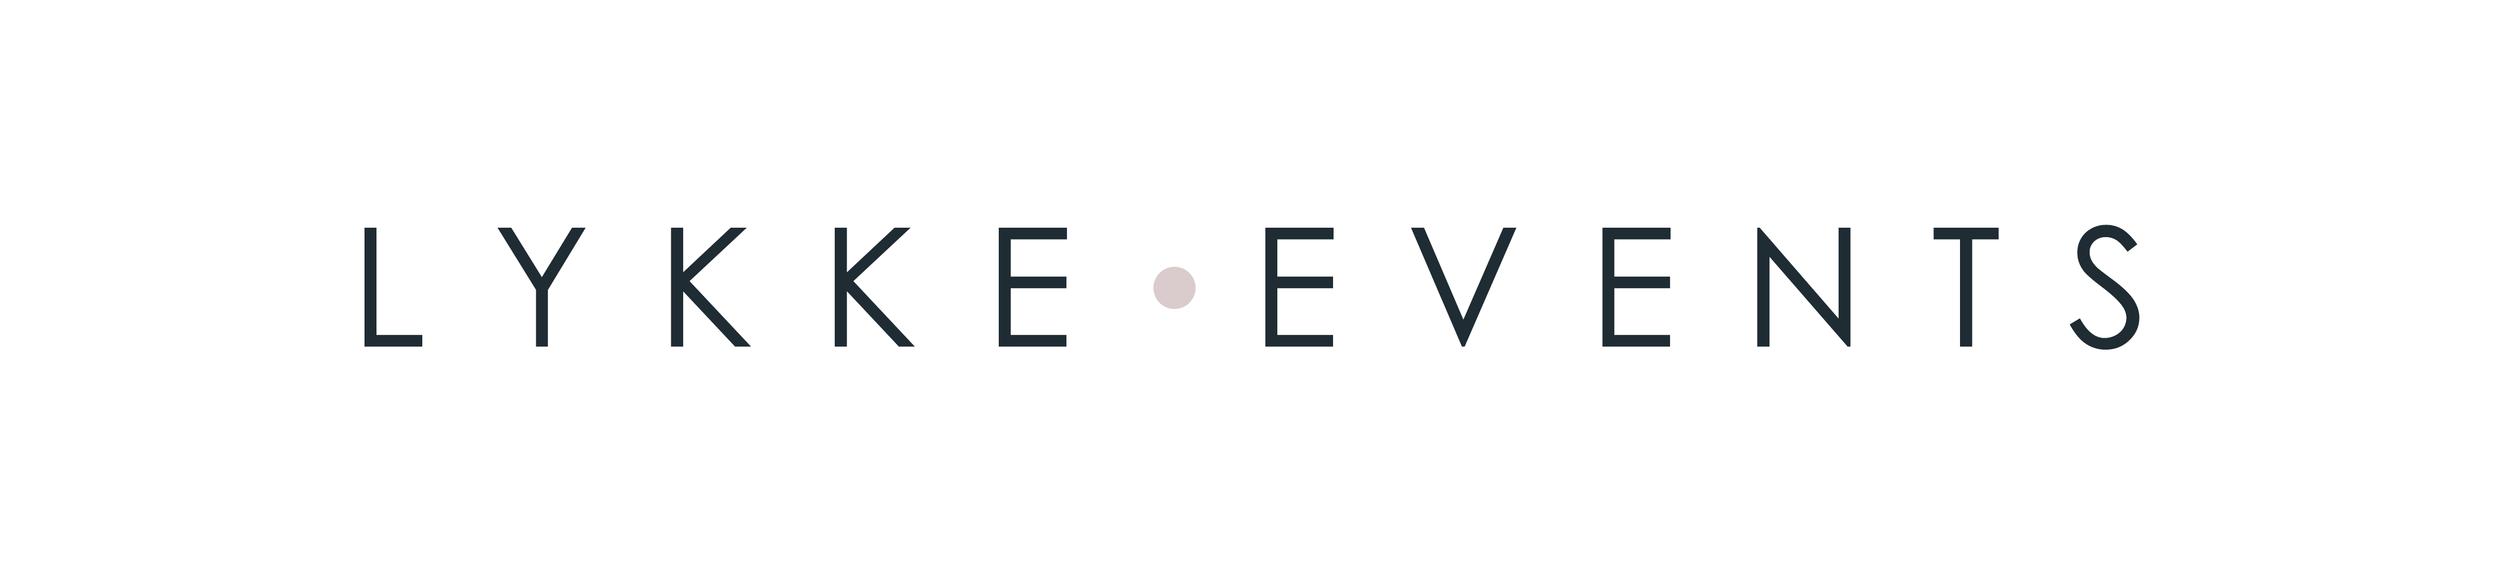 Lykke Events Logo_blue.png